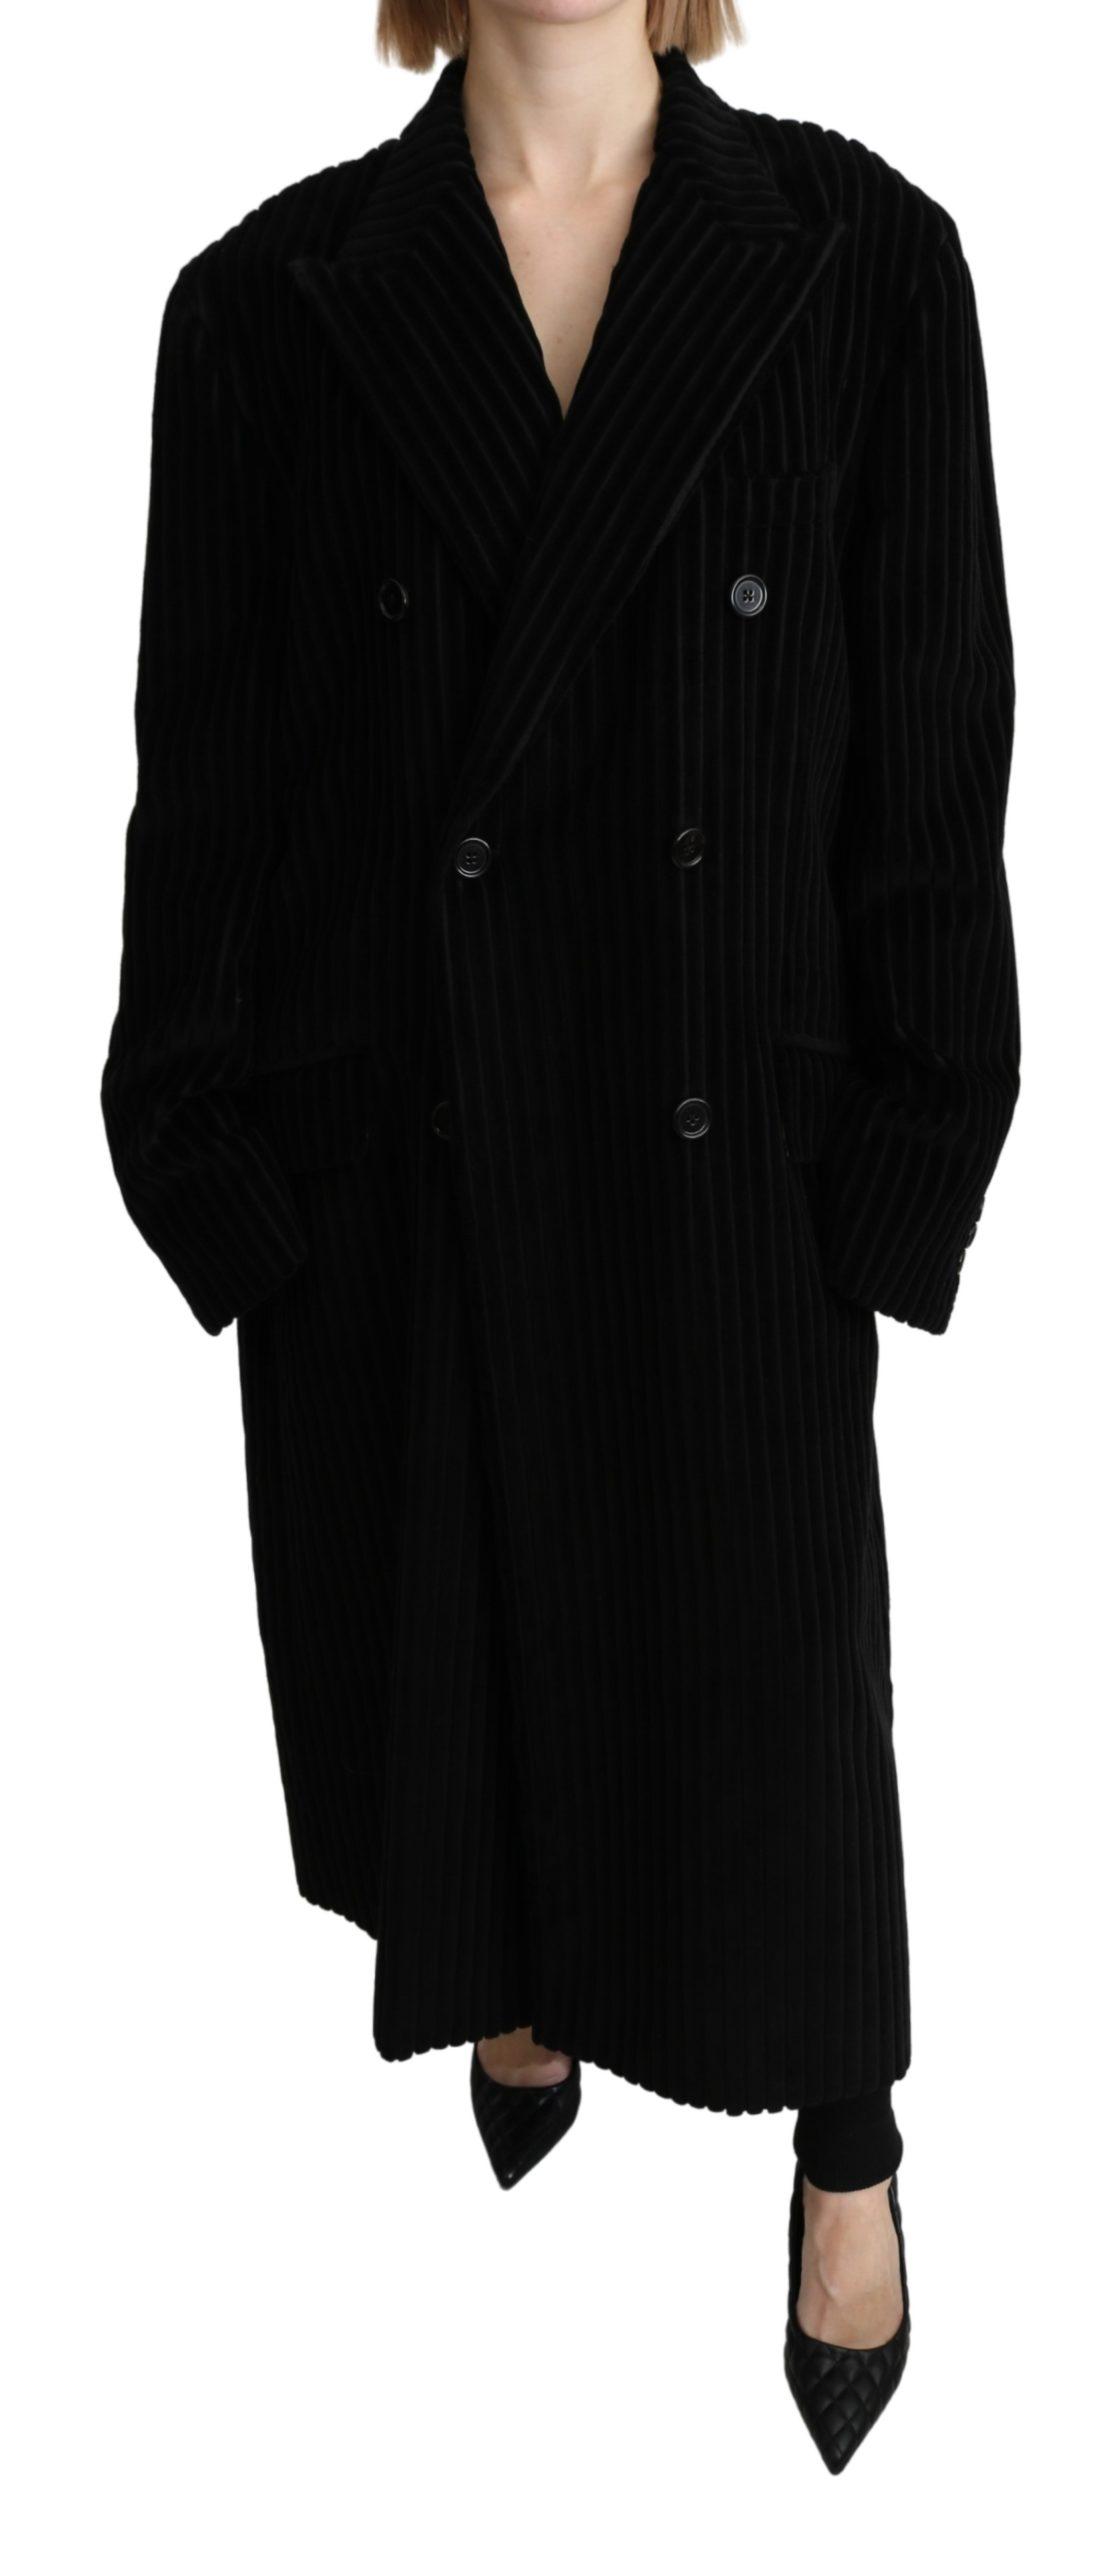 Dolce & Gabbana Women's Double Breasted Blazer Trenchcoat Jacket Black JKT2641 - IT40| L